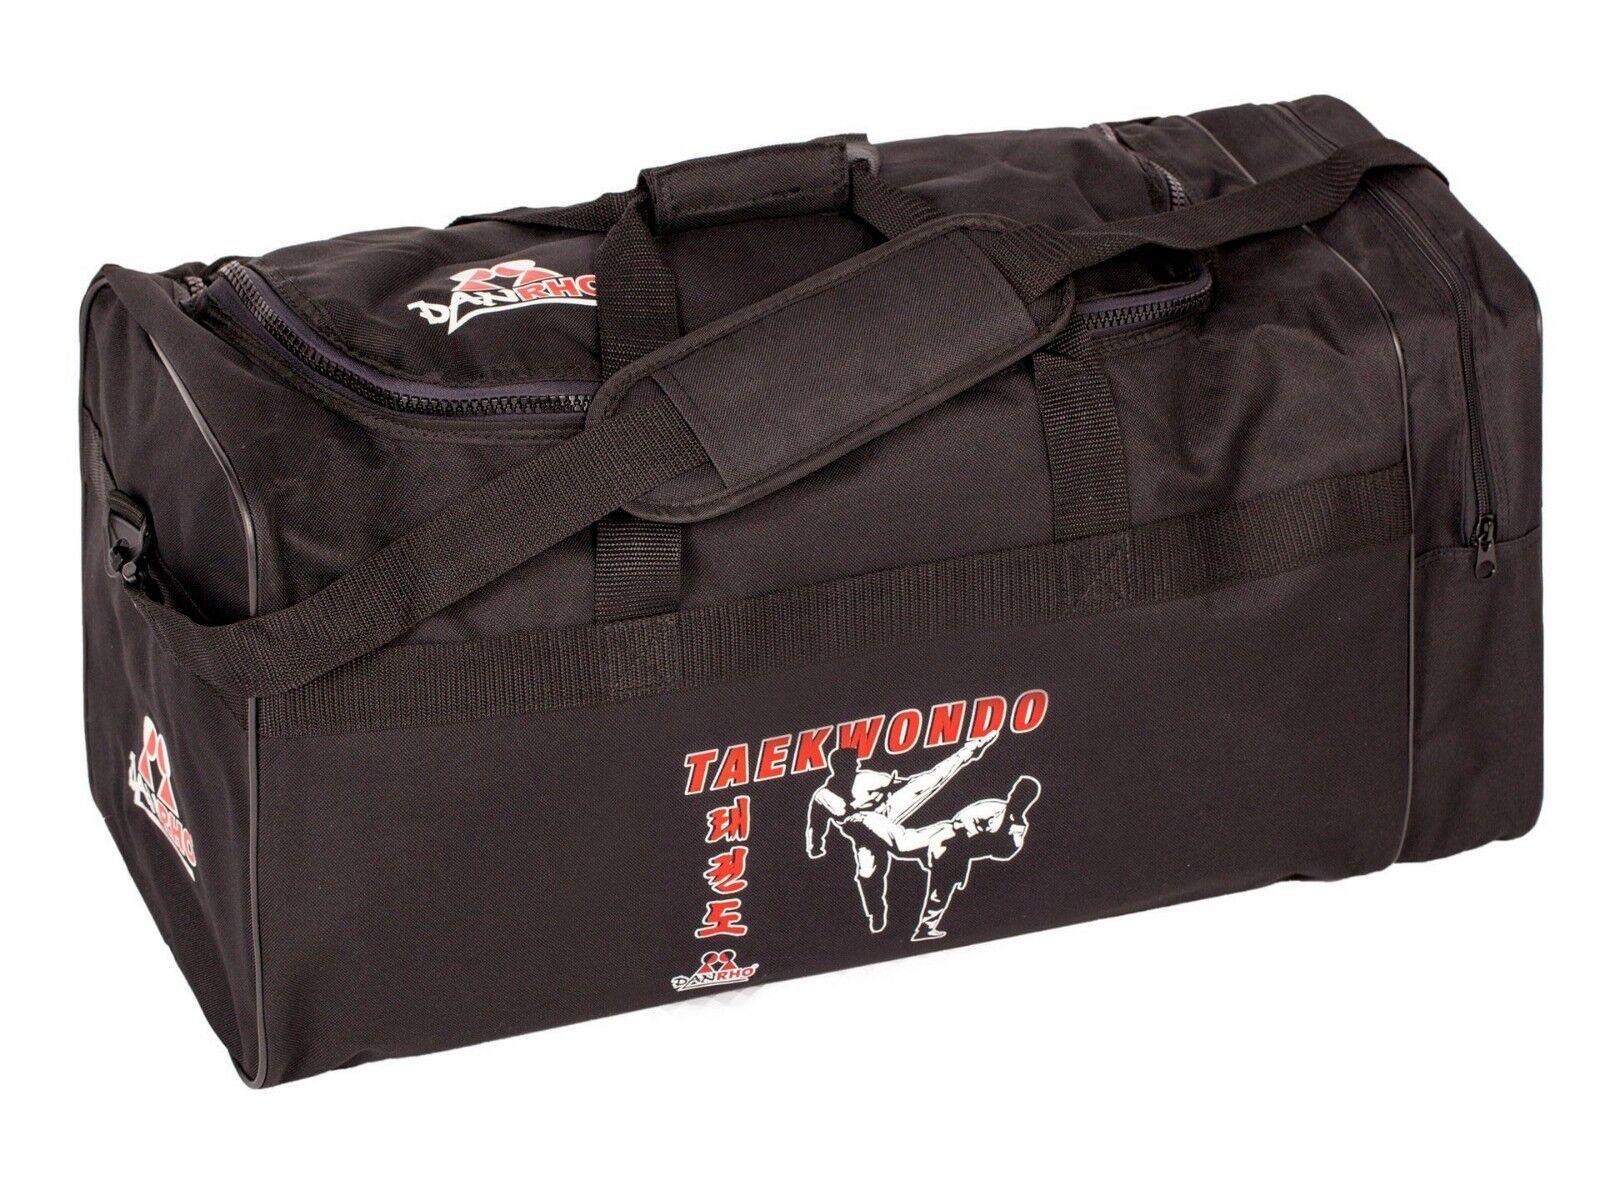 Trainings Tasche groß vers. Motive    DAN RHO. Ca.65x35x35cm. Karate TKD Judo 777542